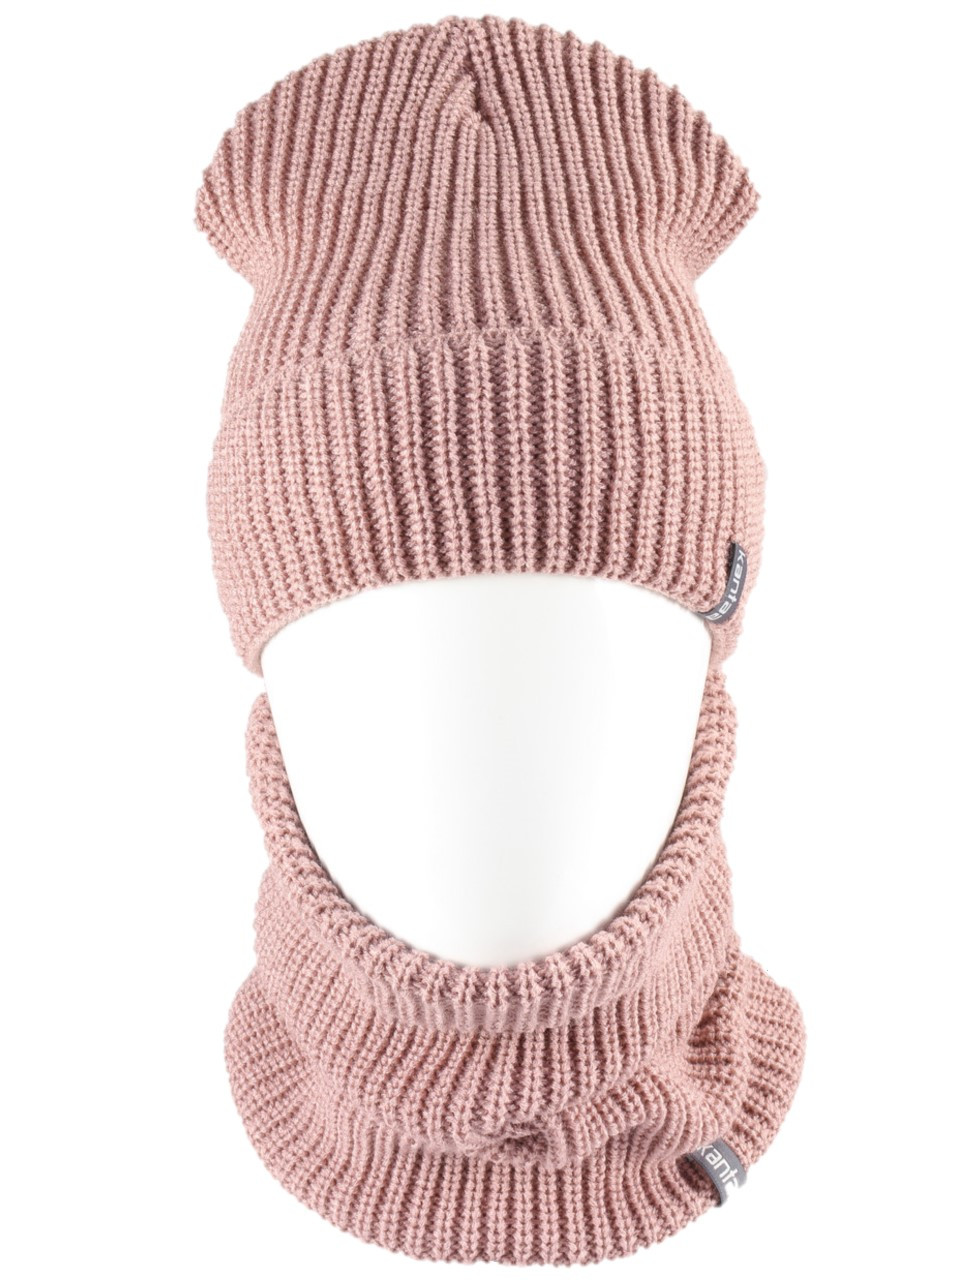 Вязаная шапка с Buff снуд КАНТА унисекс размер взрослый, пудра (OC-094)